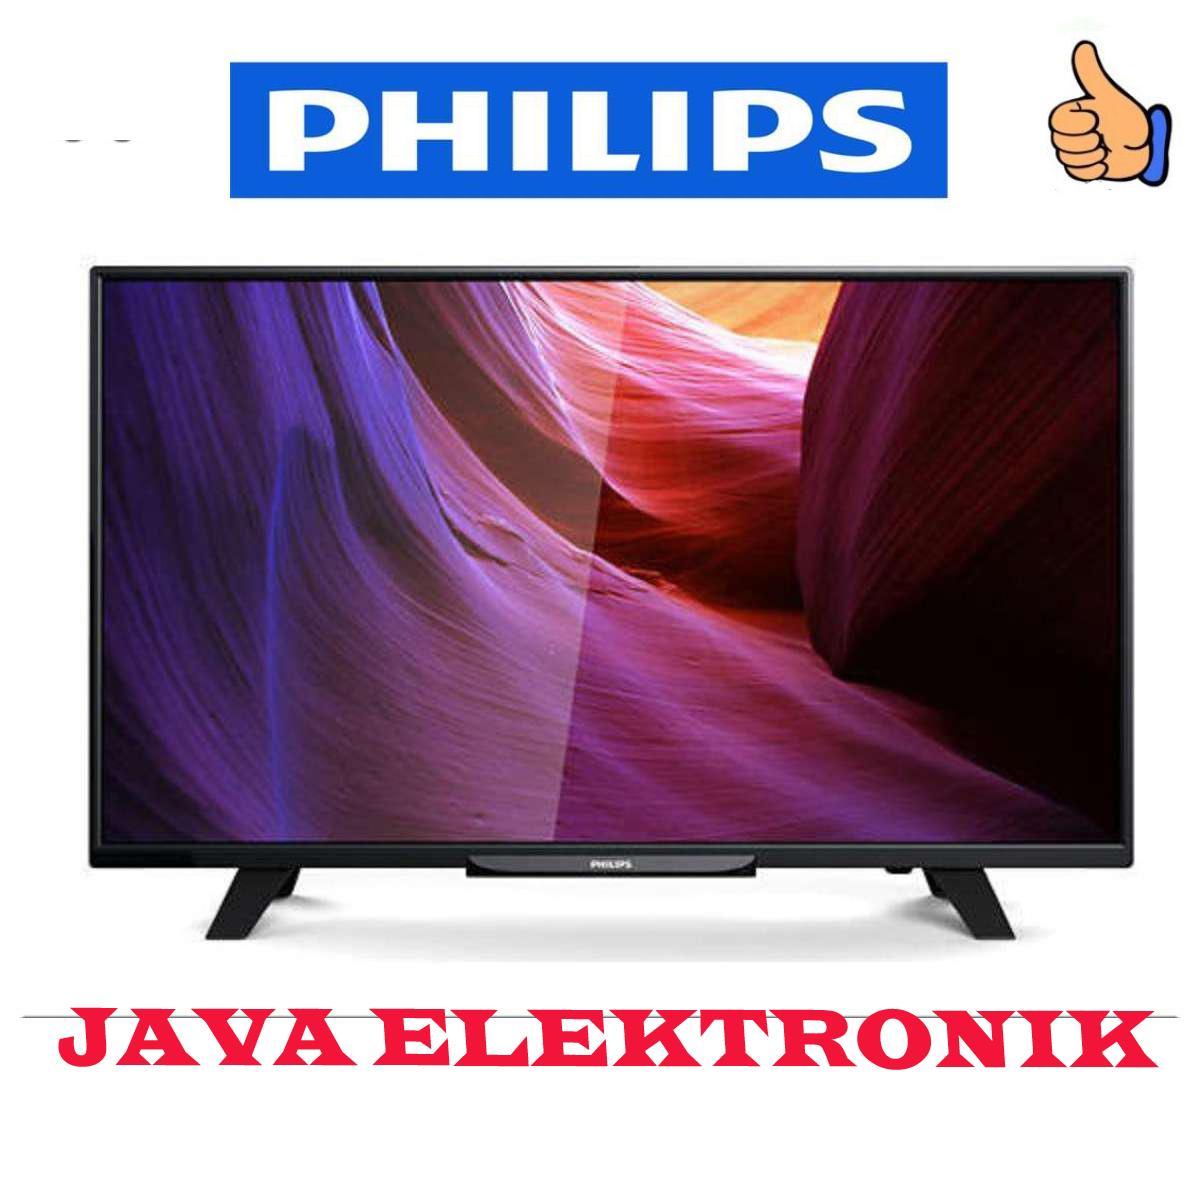 Philips 24PHA4003 Slim LED Tv - 24 Inch usb movie garansi resmi